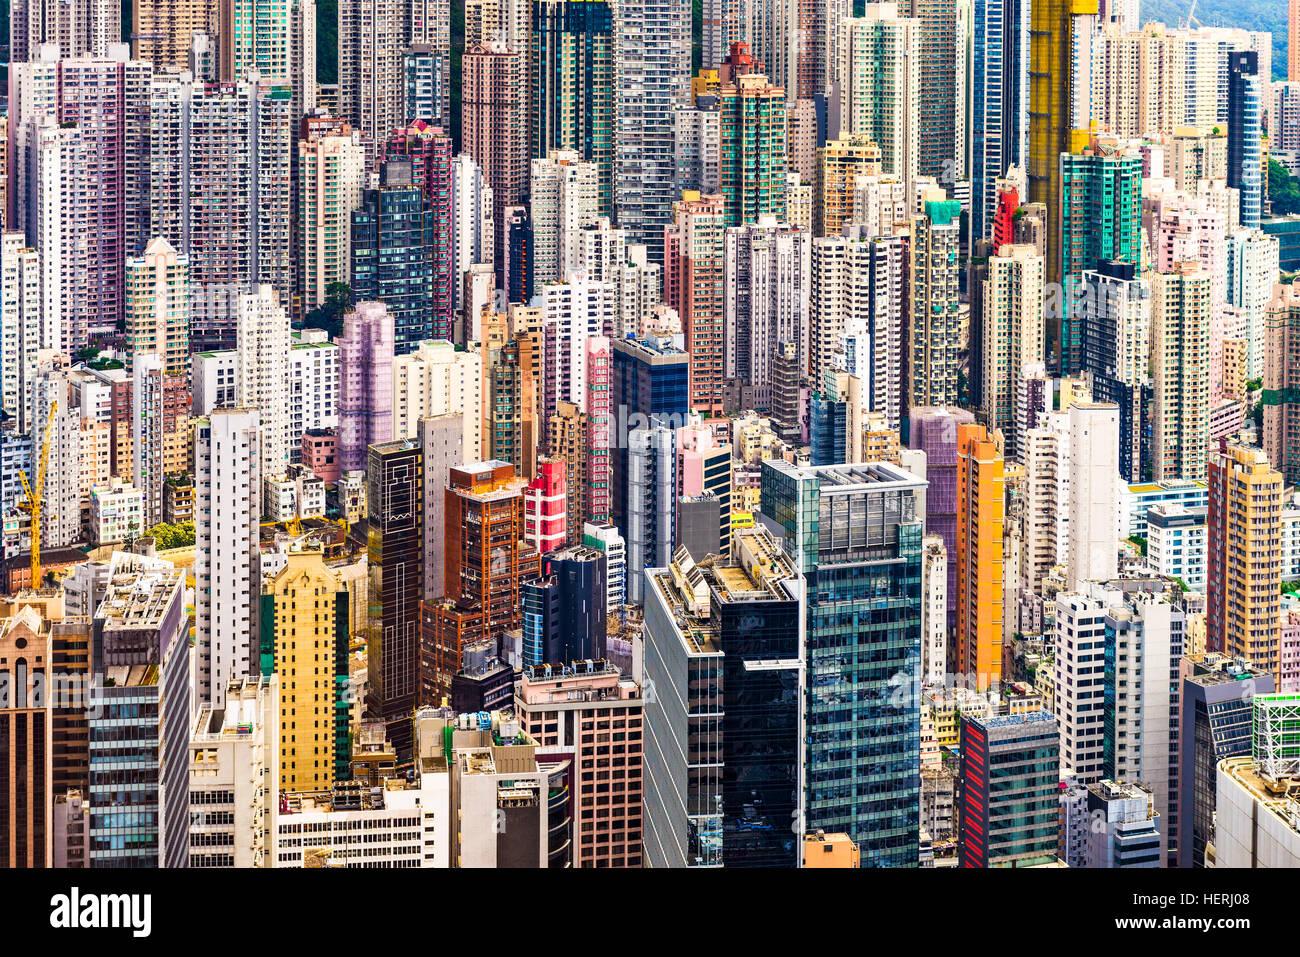 Hong Kong Chine bâtiments urbains denses Photo Stock